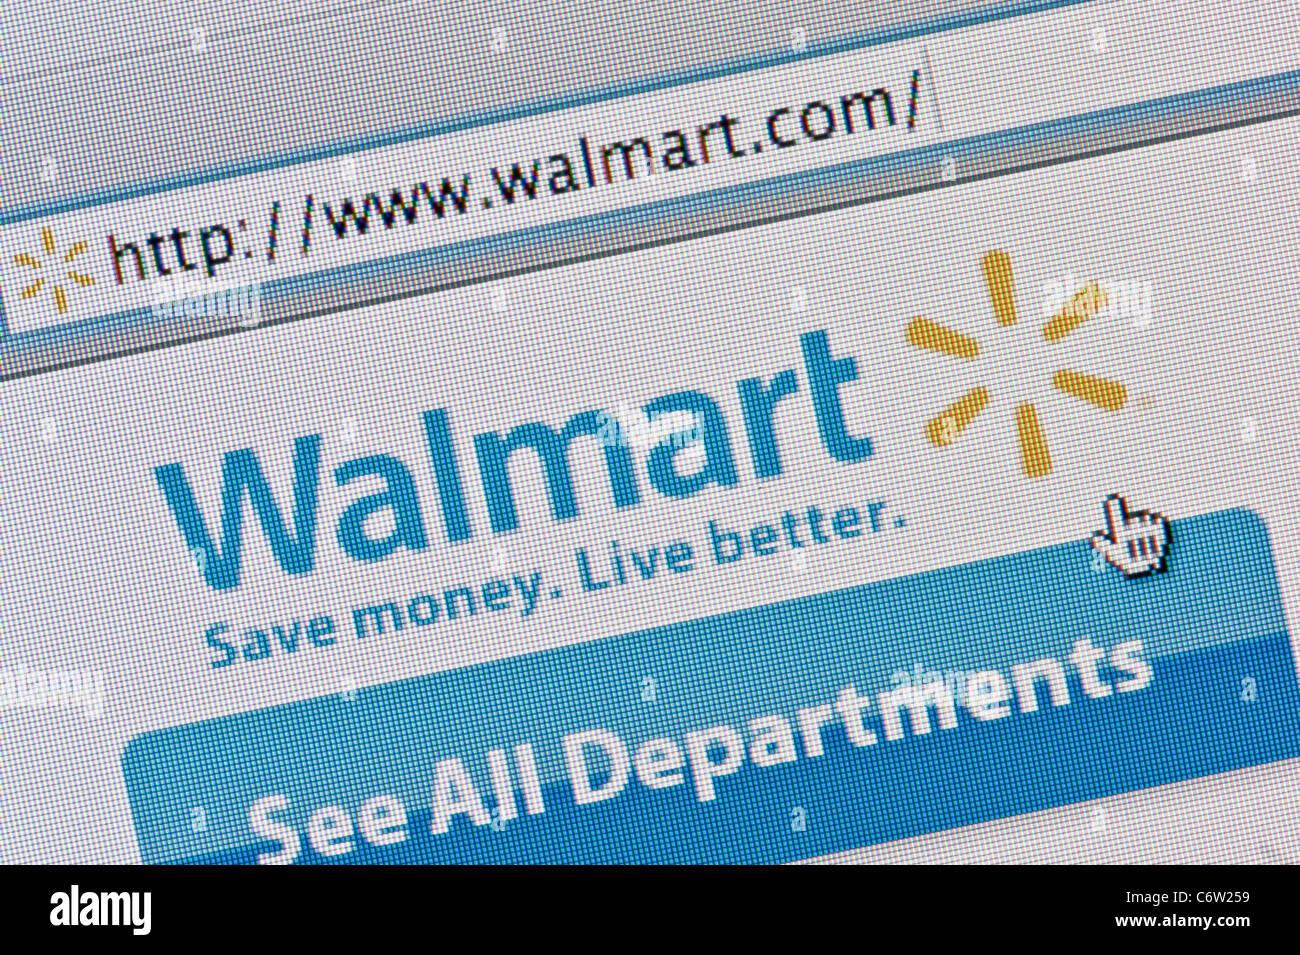 Walmart Stores Stock Photos & Walmart Stores Stock Images - Alamy